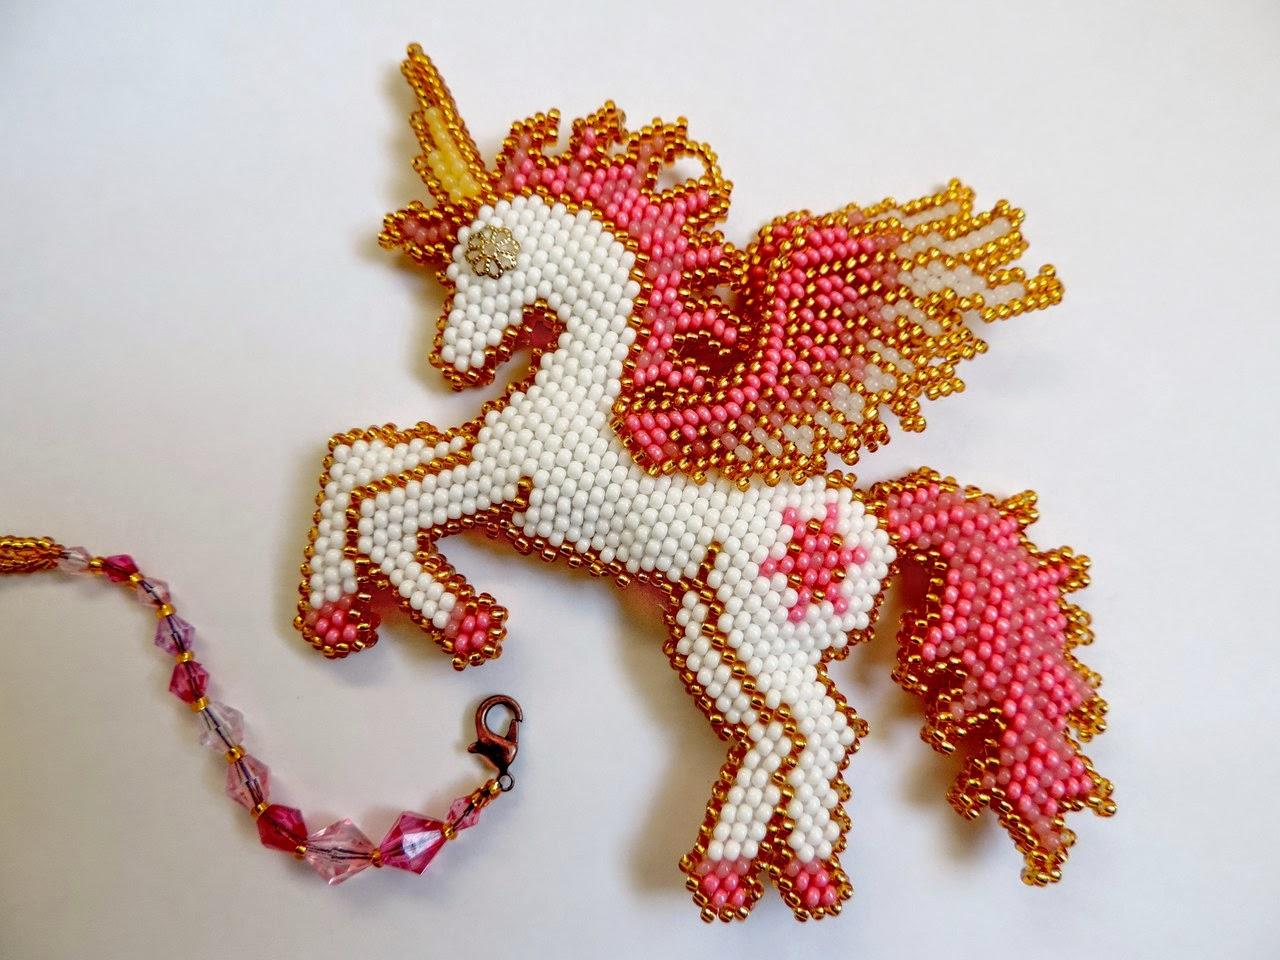 схема лошадки крючок